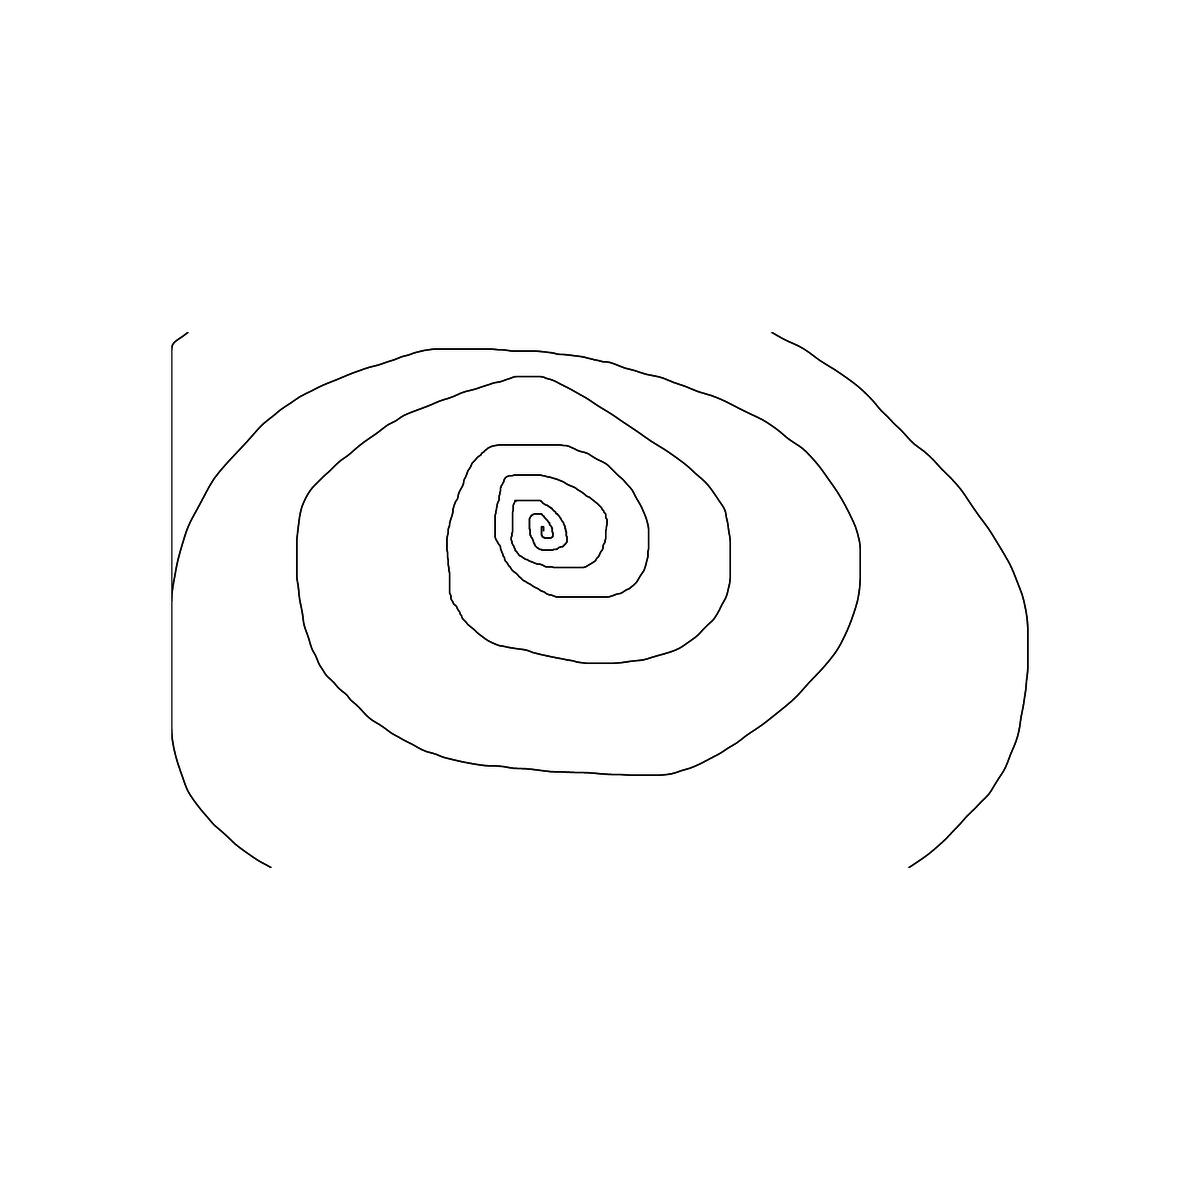 BAAAM drawing#3193 lat:44.7058753967285160lng: -63.5448799133300800